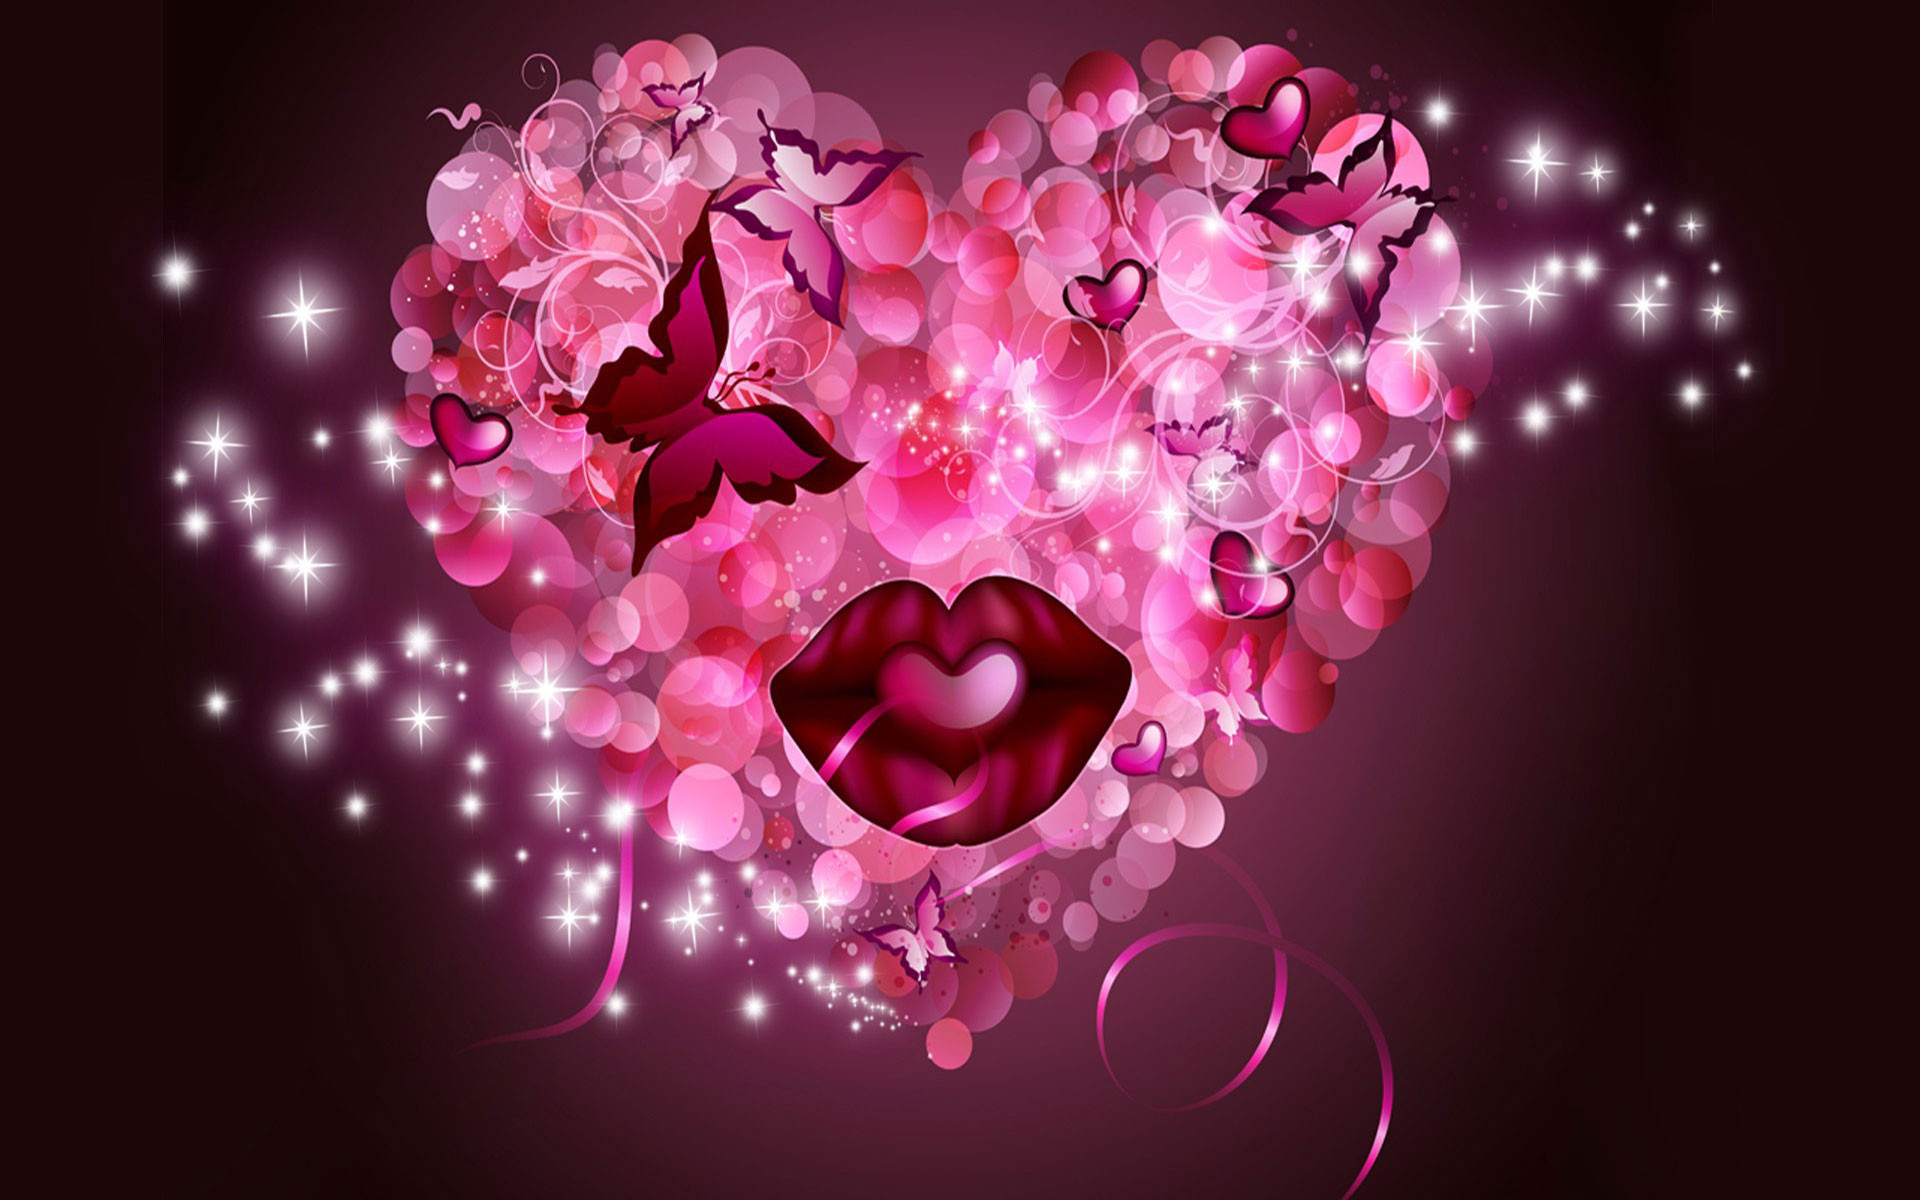 Res: 1920x1200, pink-heart-hd-wide-wallpaper